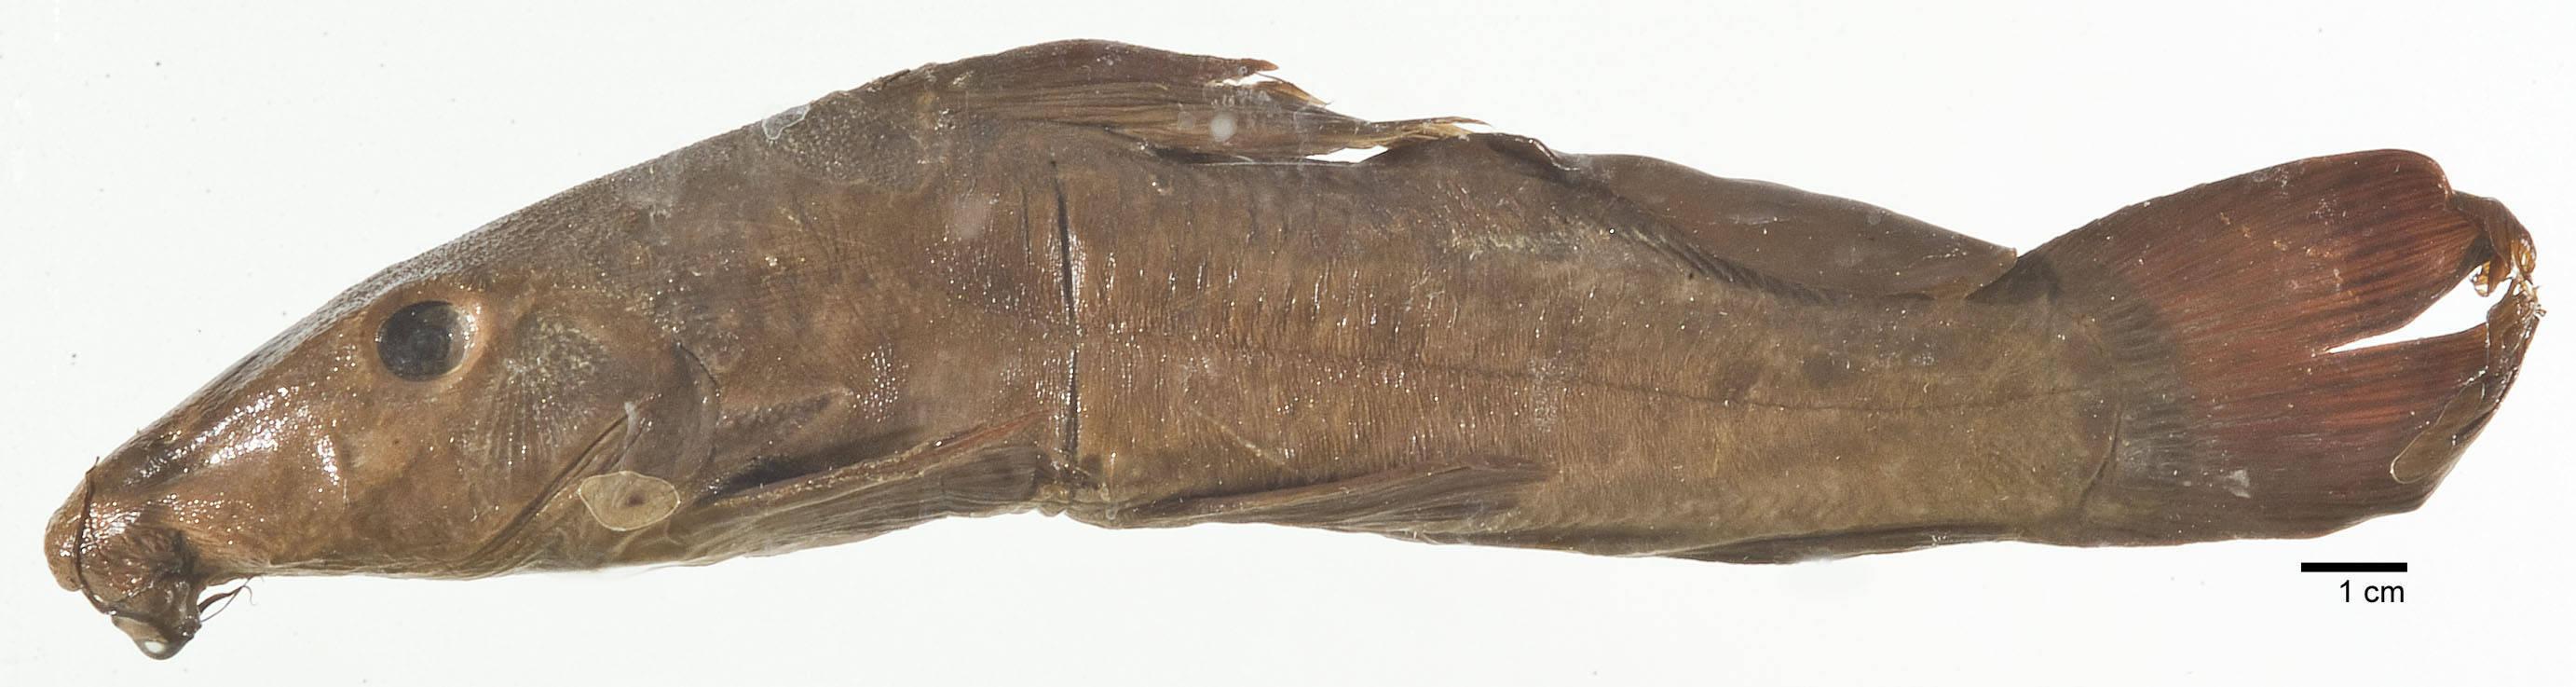 Image of <i>Auchenoglanis biscutatus</i> (Geoffroy Saint-Hilaire 1809)